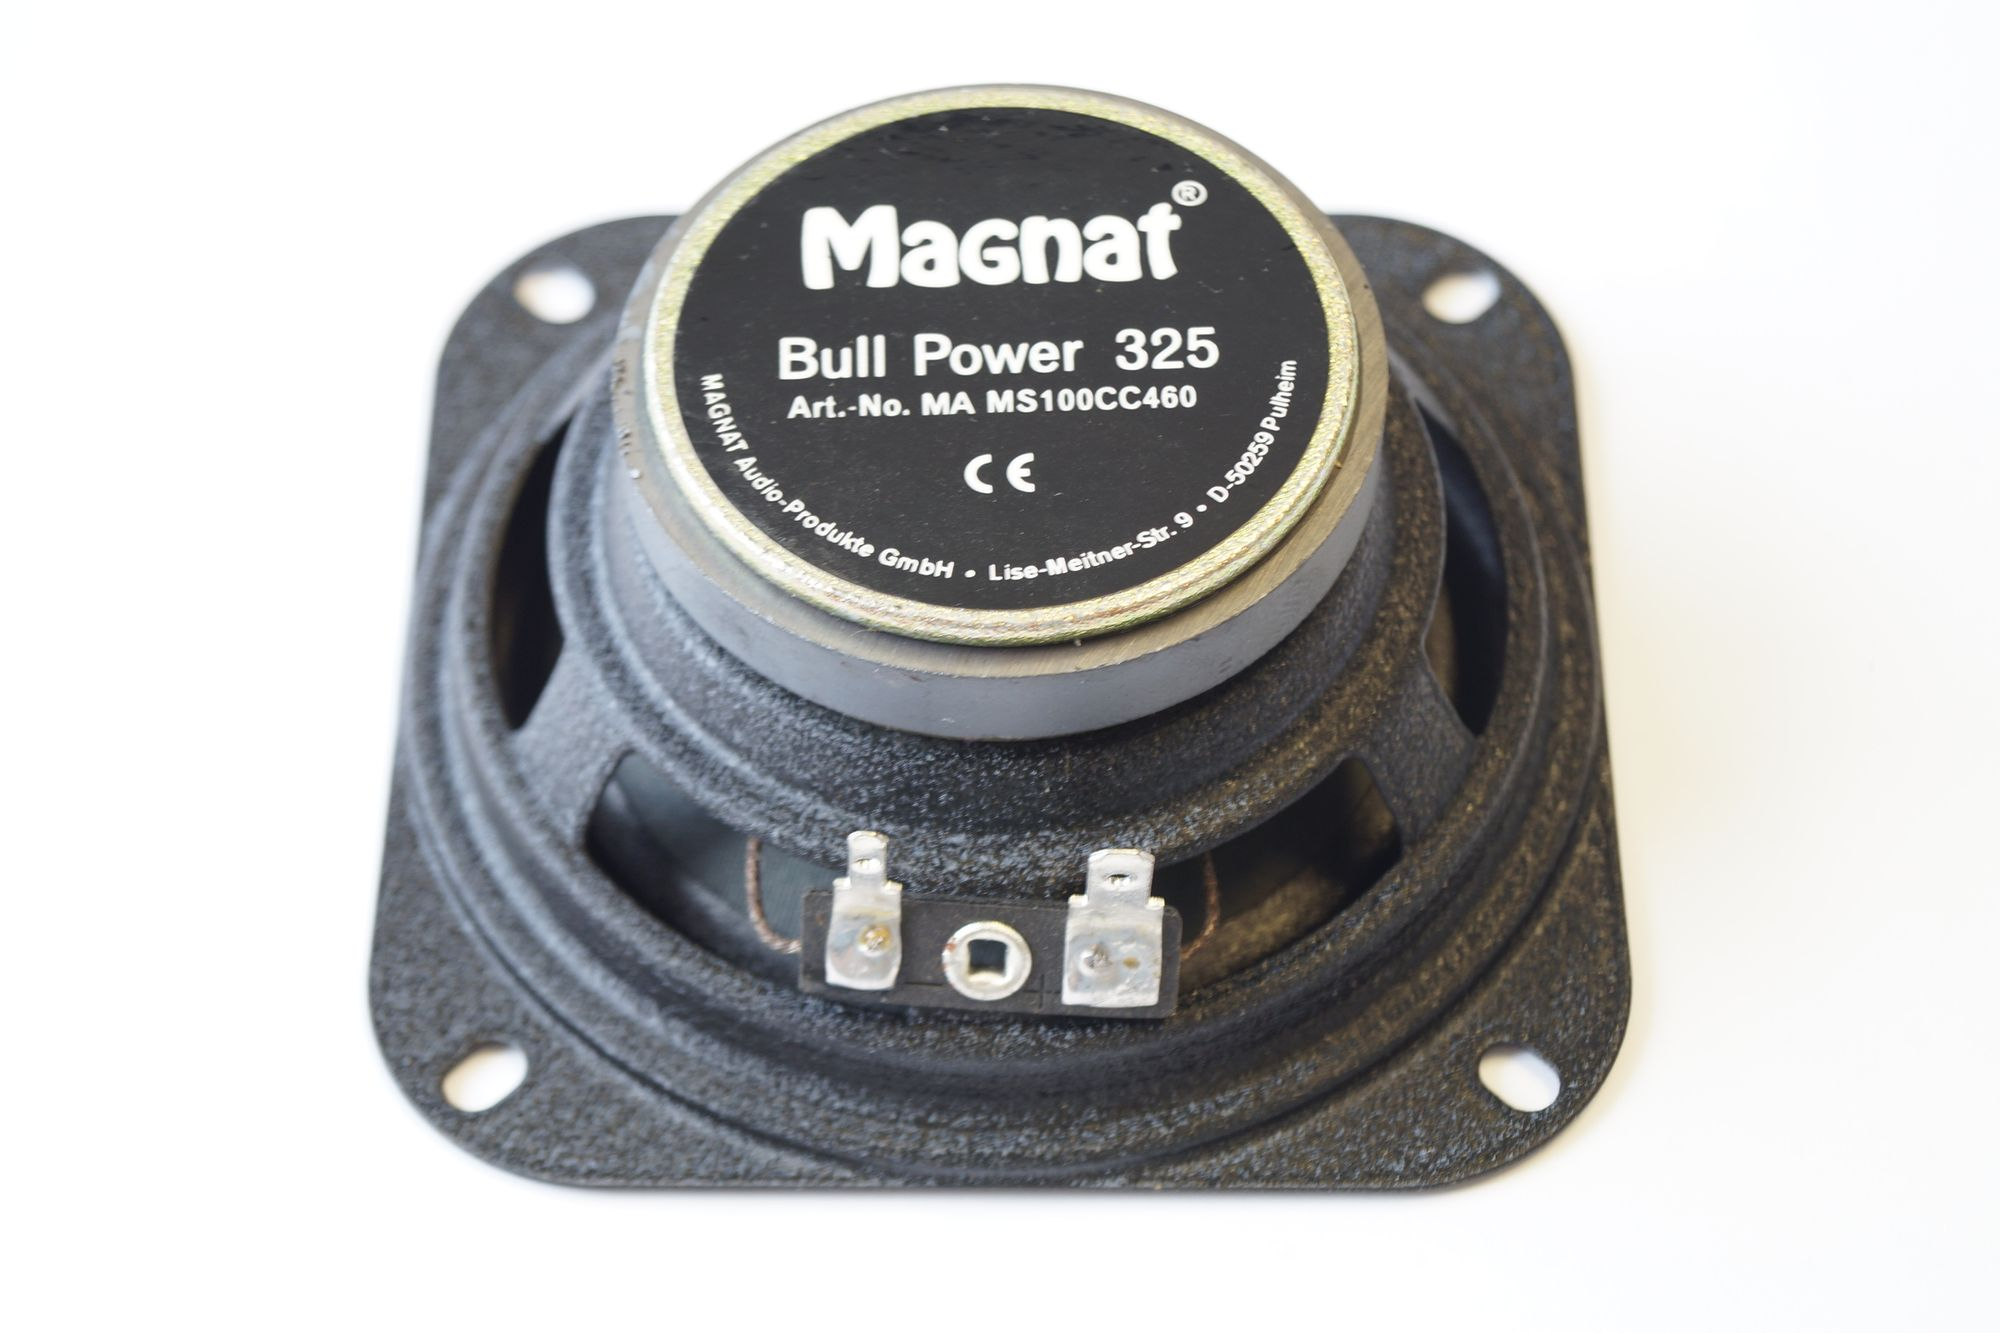 100 mm Mitteltöner Magnat Bull Power 325  – Bild 2